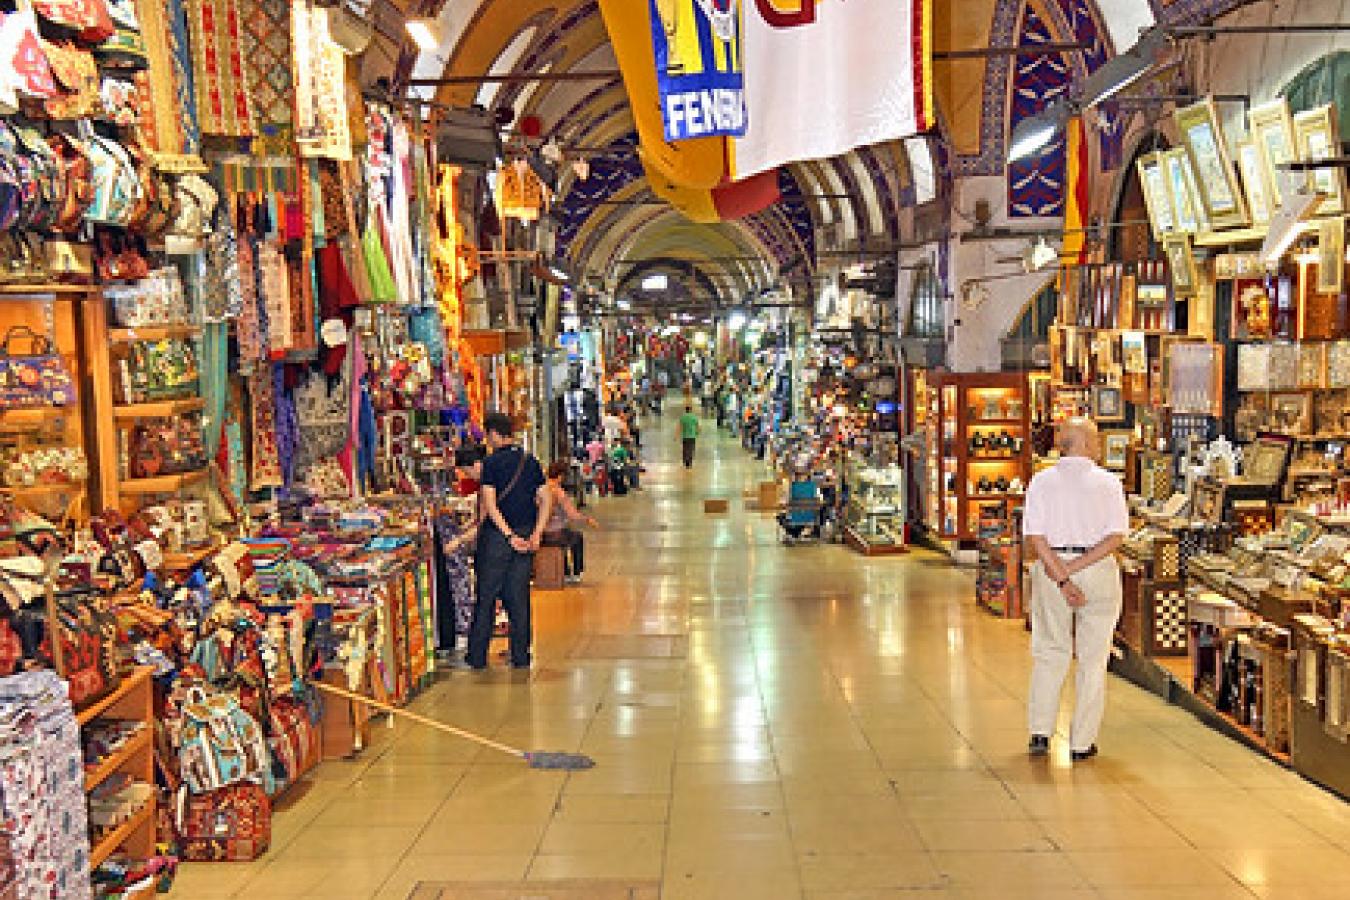 Turkey - Inside the Grand Bazaar